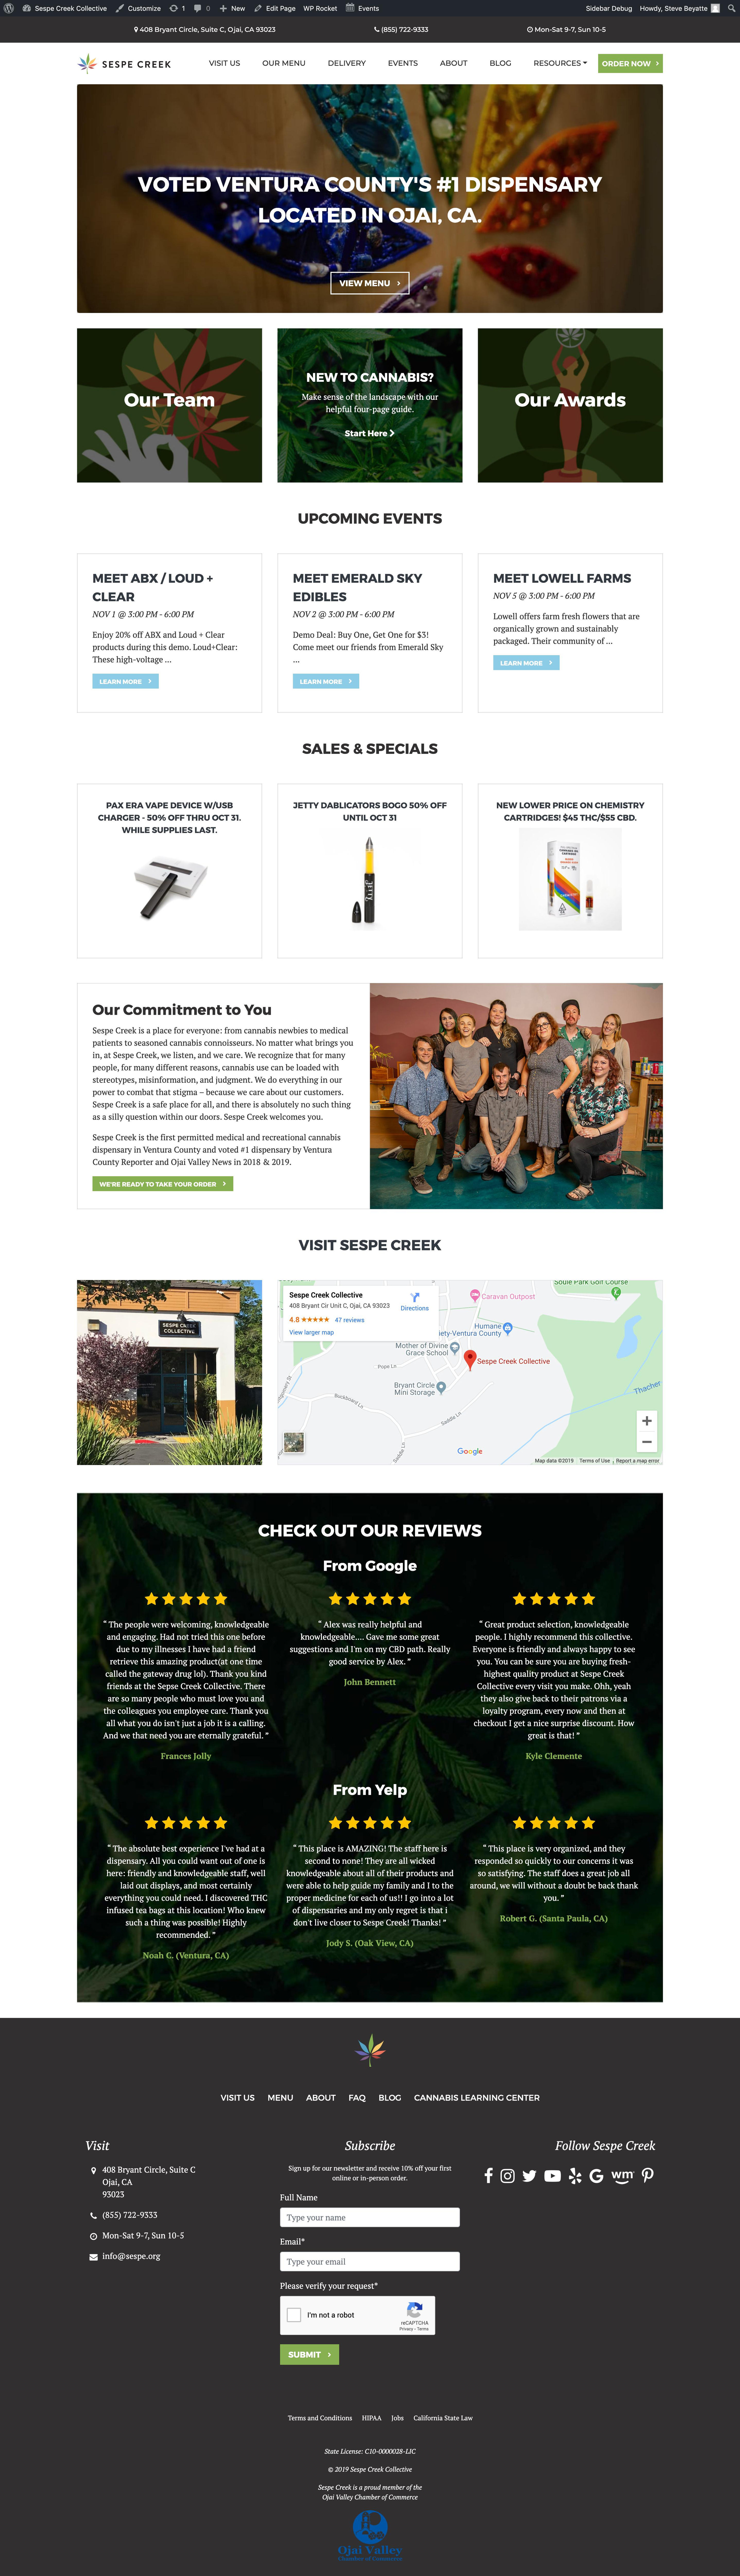 Sespe Creek website built by Aquatic in San Francisco